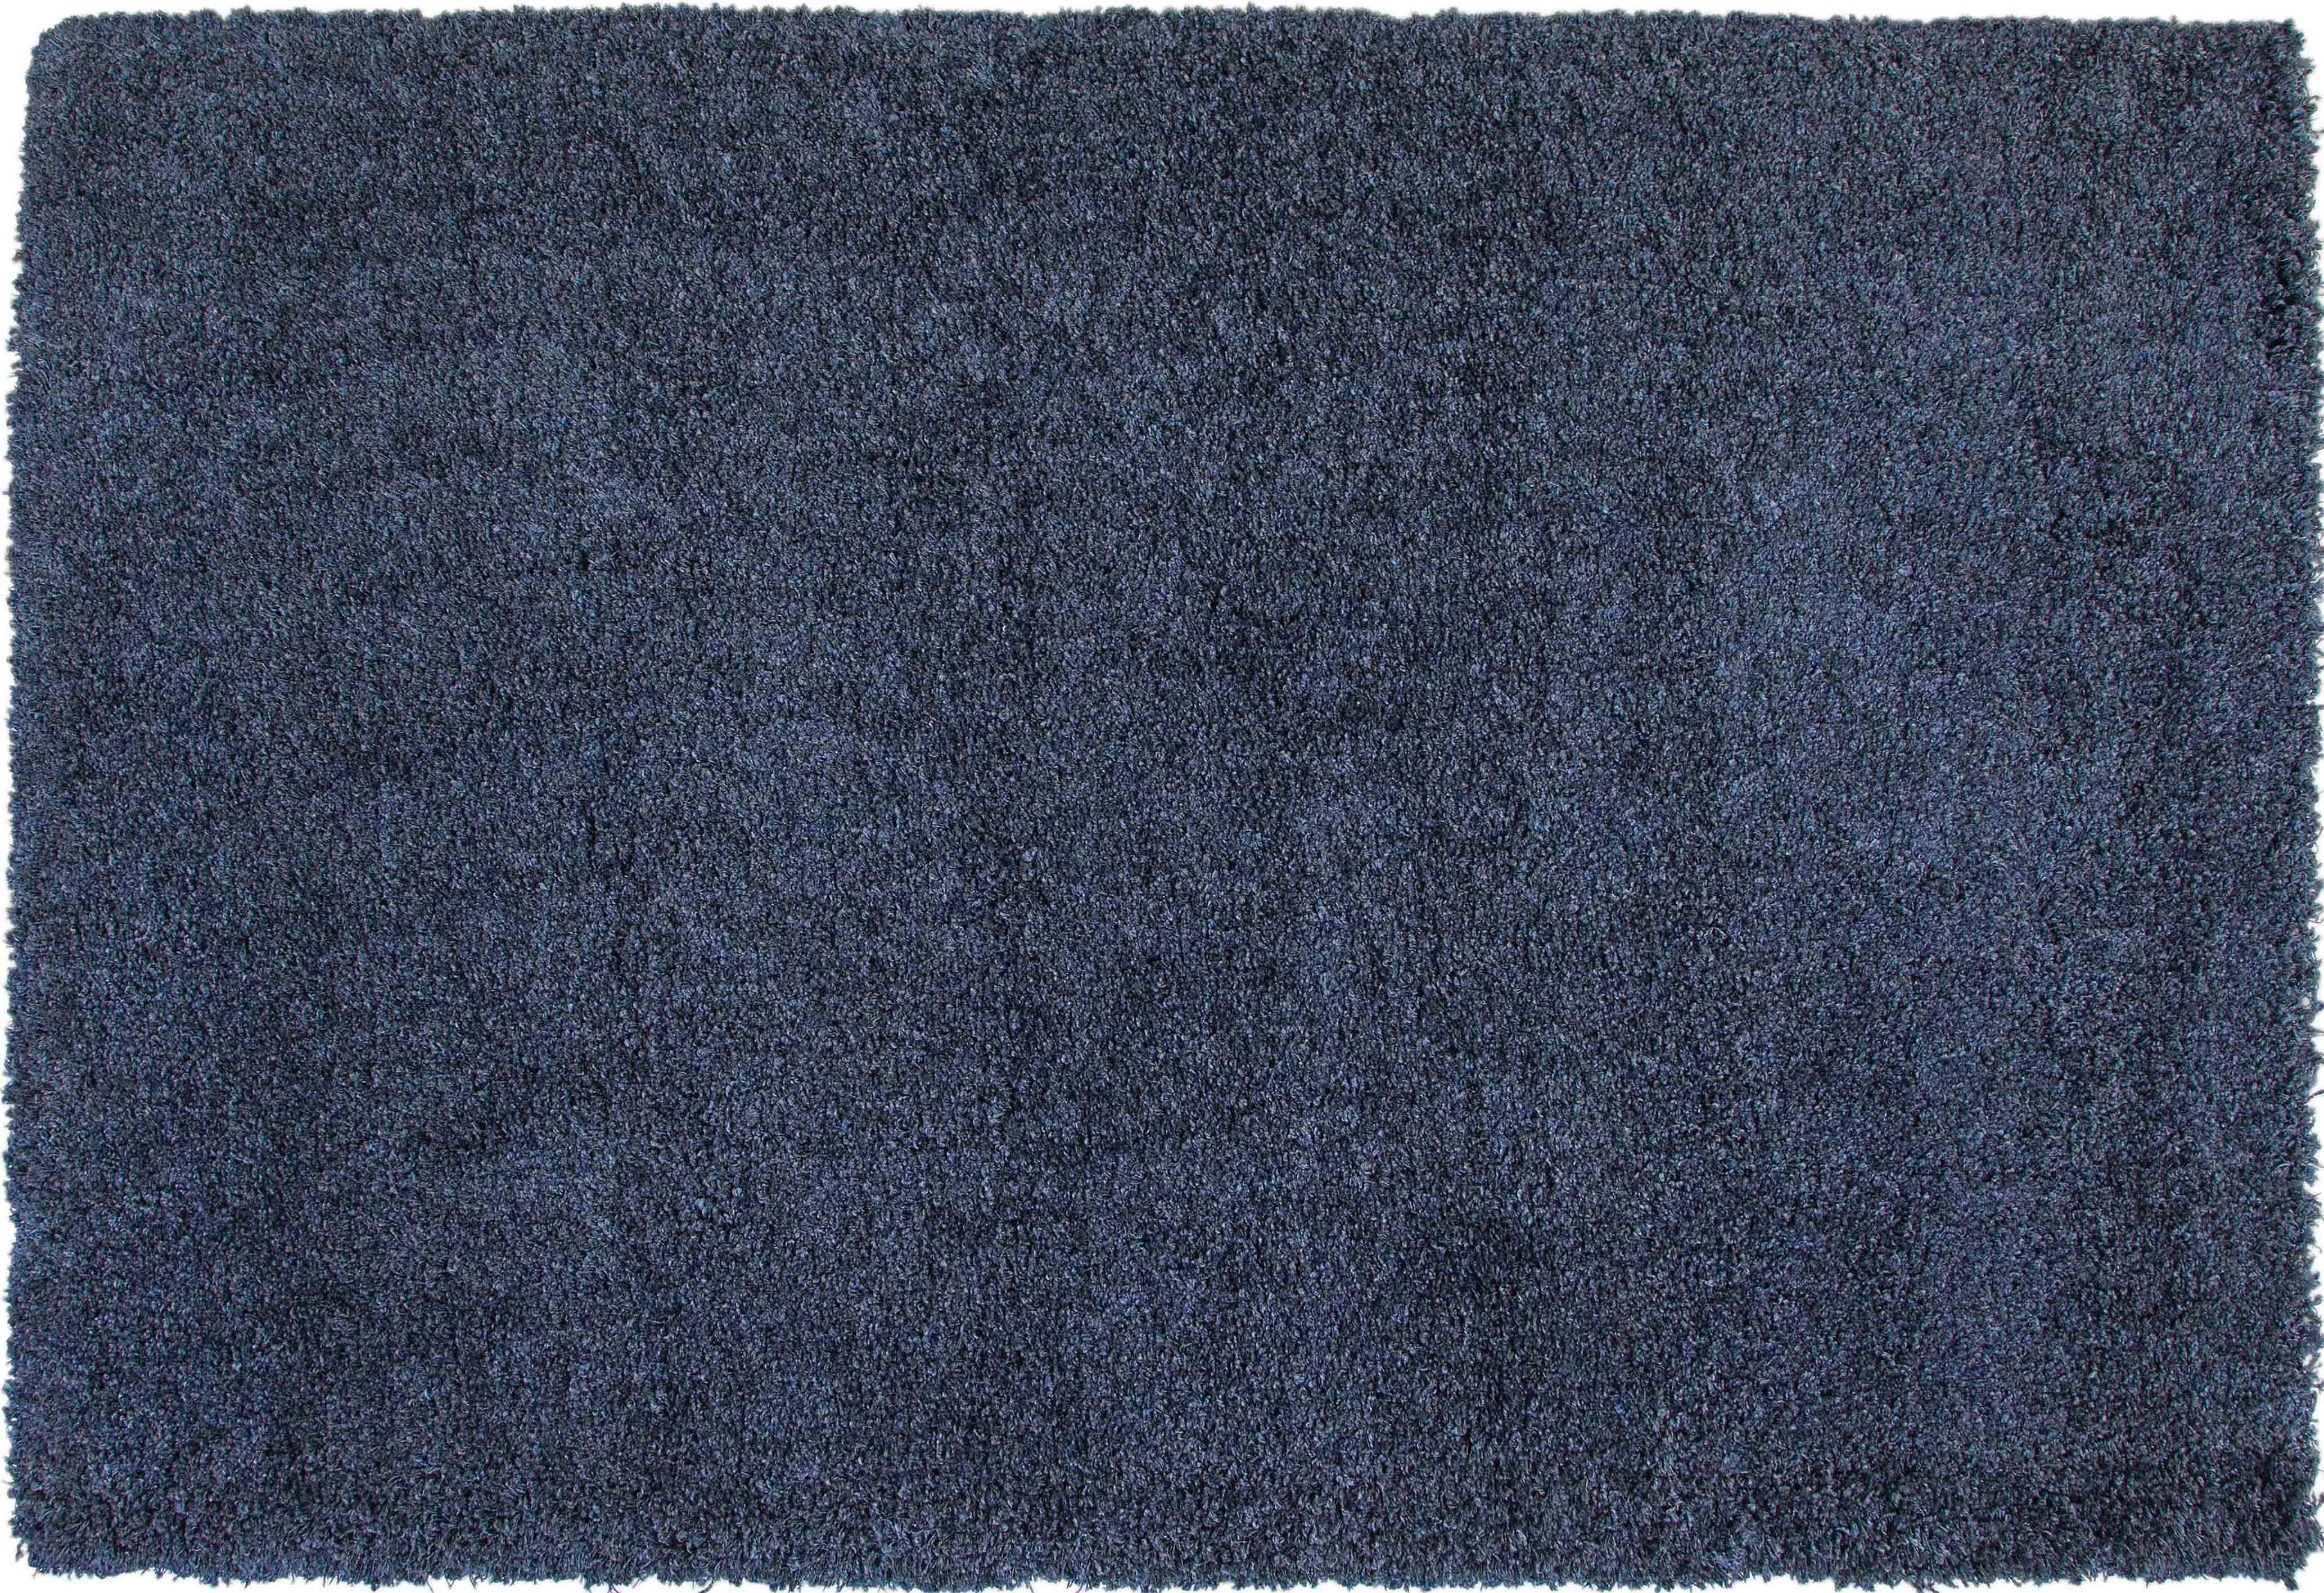 Comfort Shag Blue Rug Media Image 1